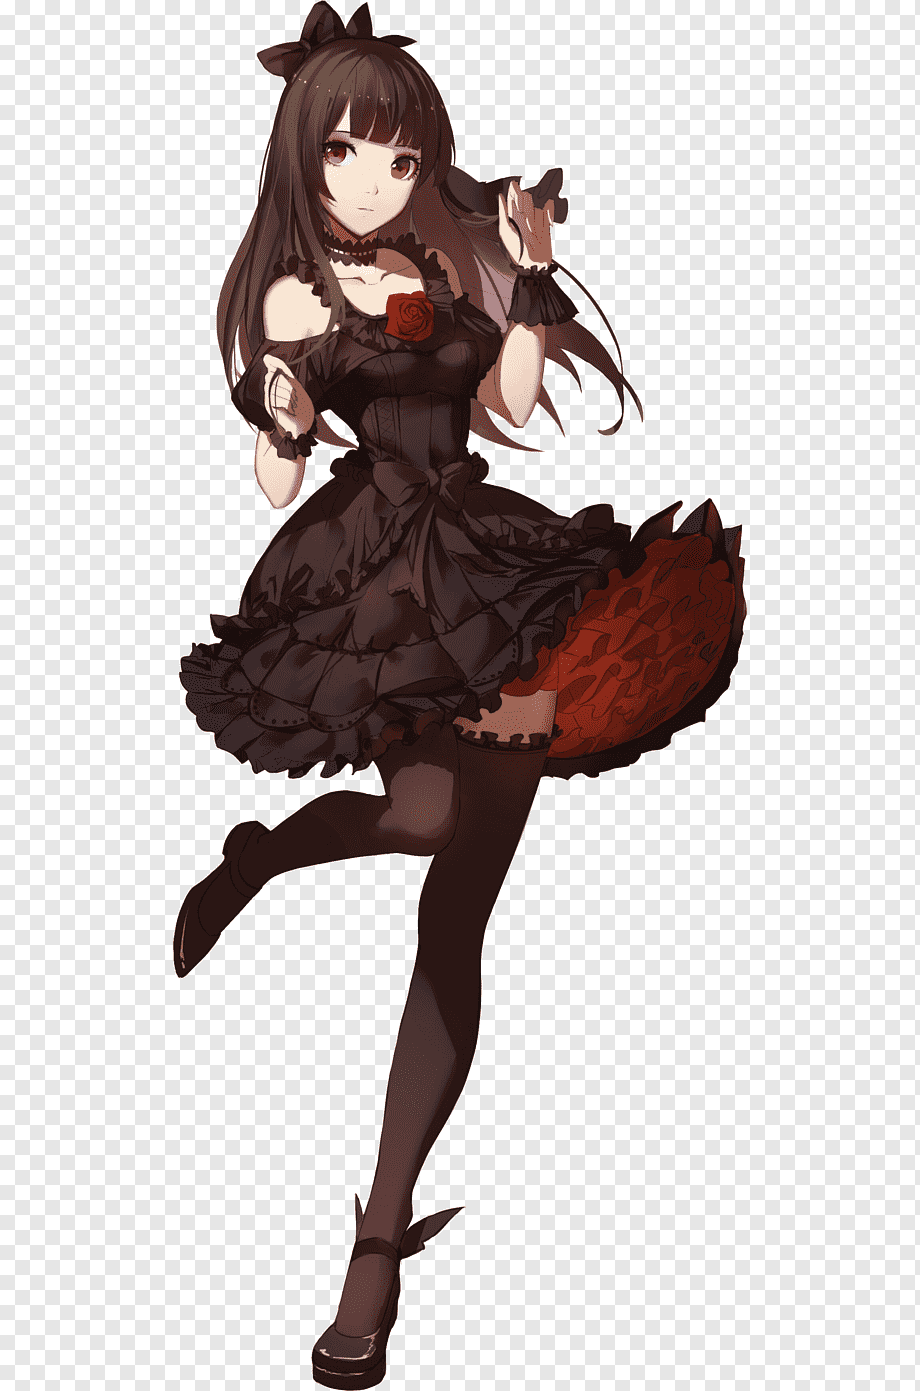 Anime Black Dress : anime, black, dress, Anime, Little, Black, Dress, Manga, Clothing,, Anime,, Blue,, Hair,, PNGWing